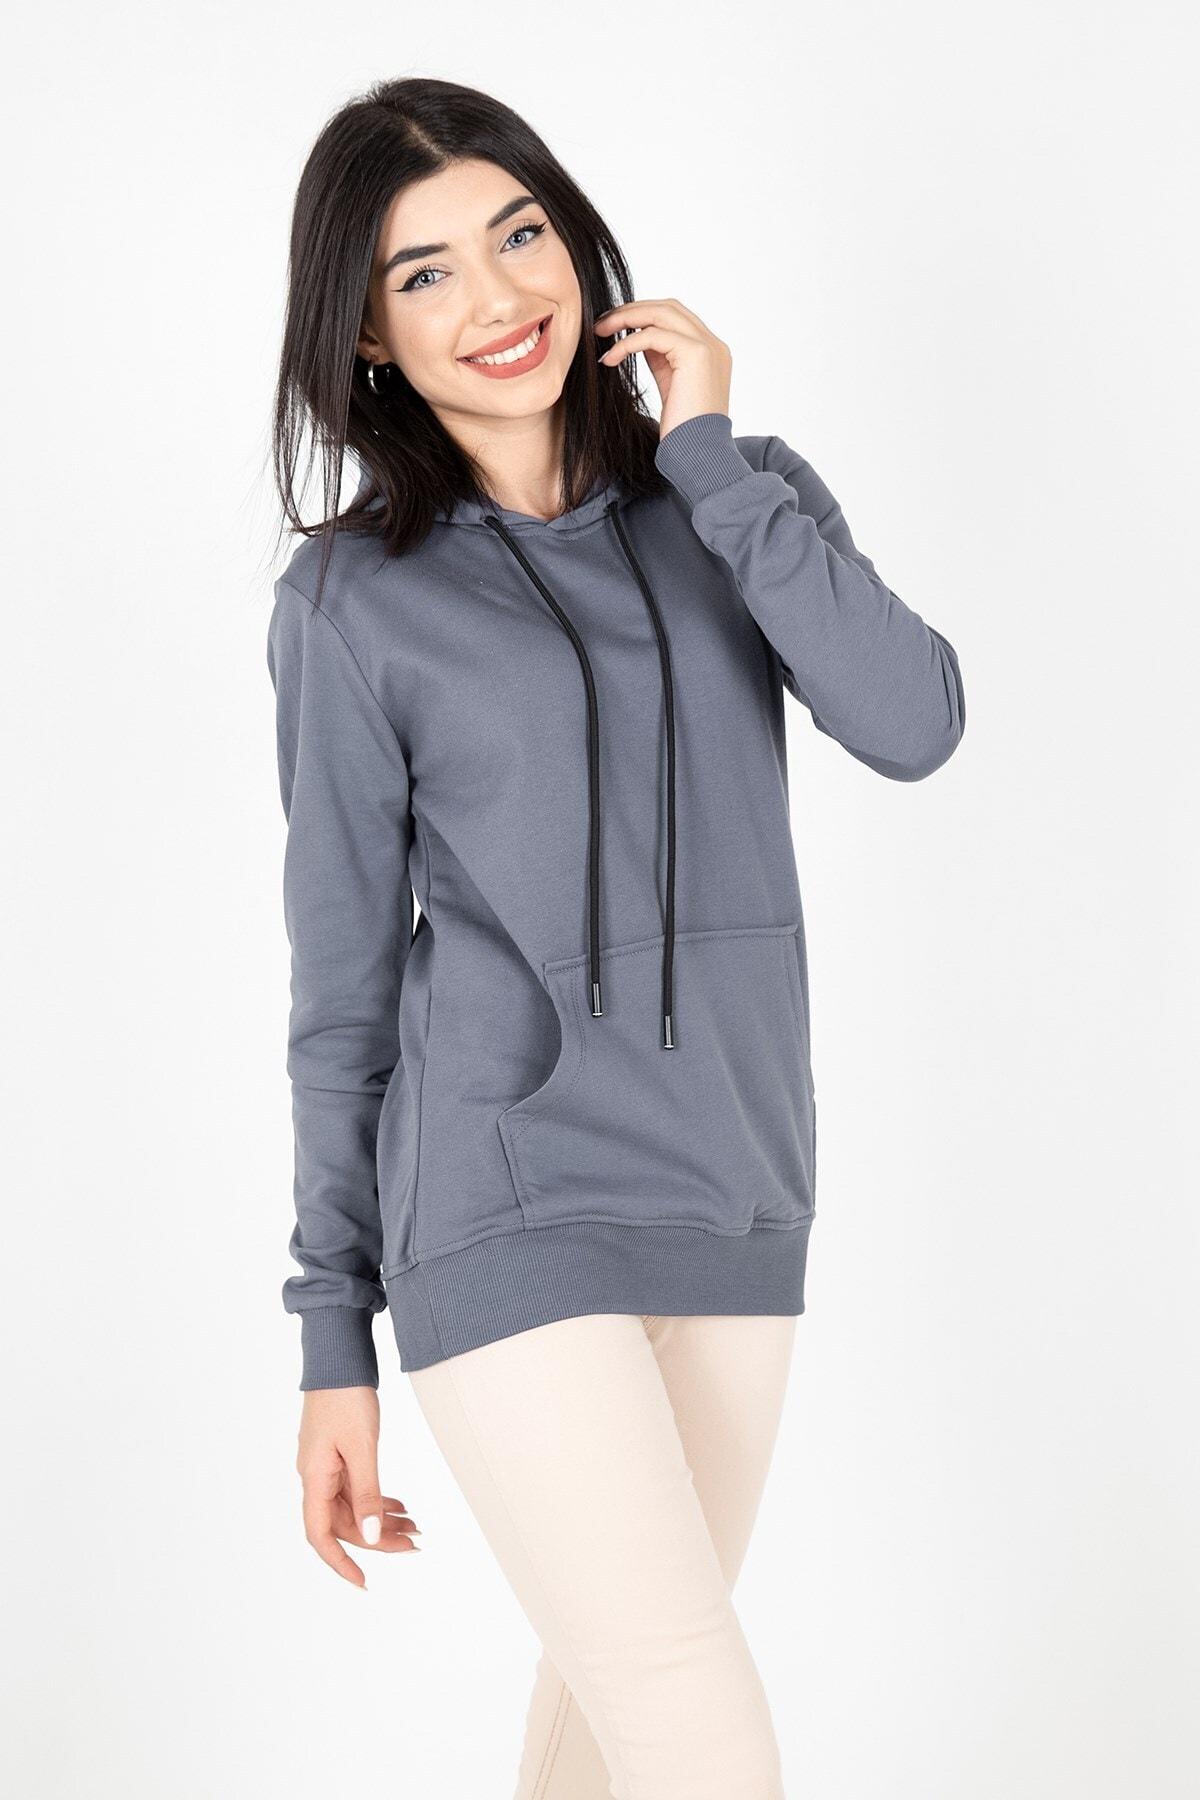 MY LIFE Mylife Kapüşonlu Kanguru Cep Kadın Sweatshirt Füme - Mlf2735 1